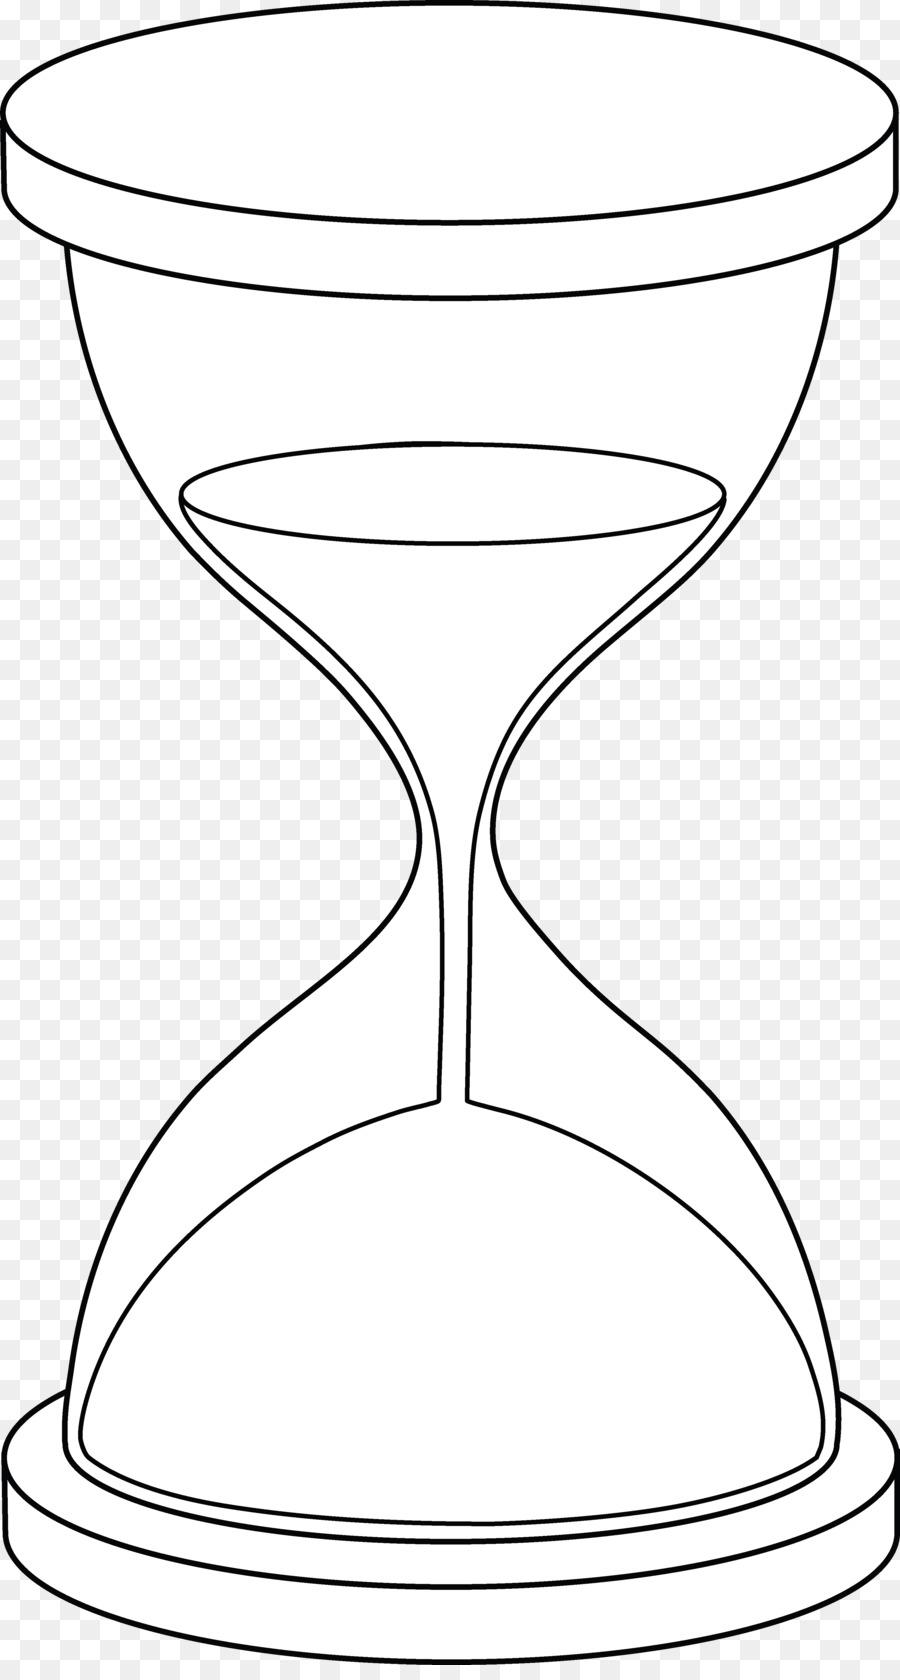 Reloj De Arena Libro Para Colorear Dibujo Imagen Png